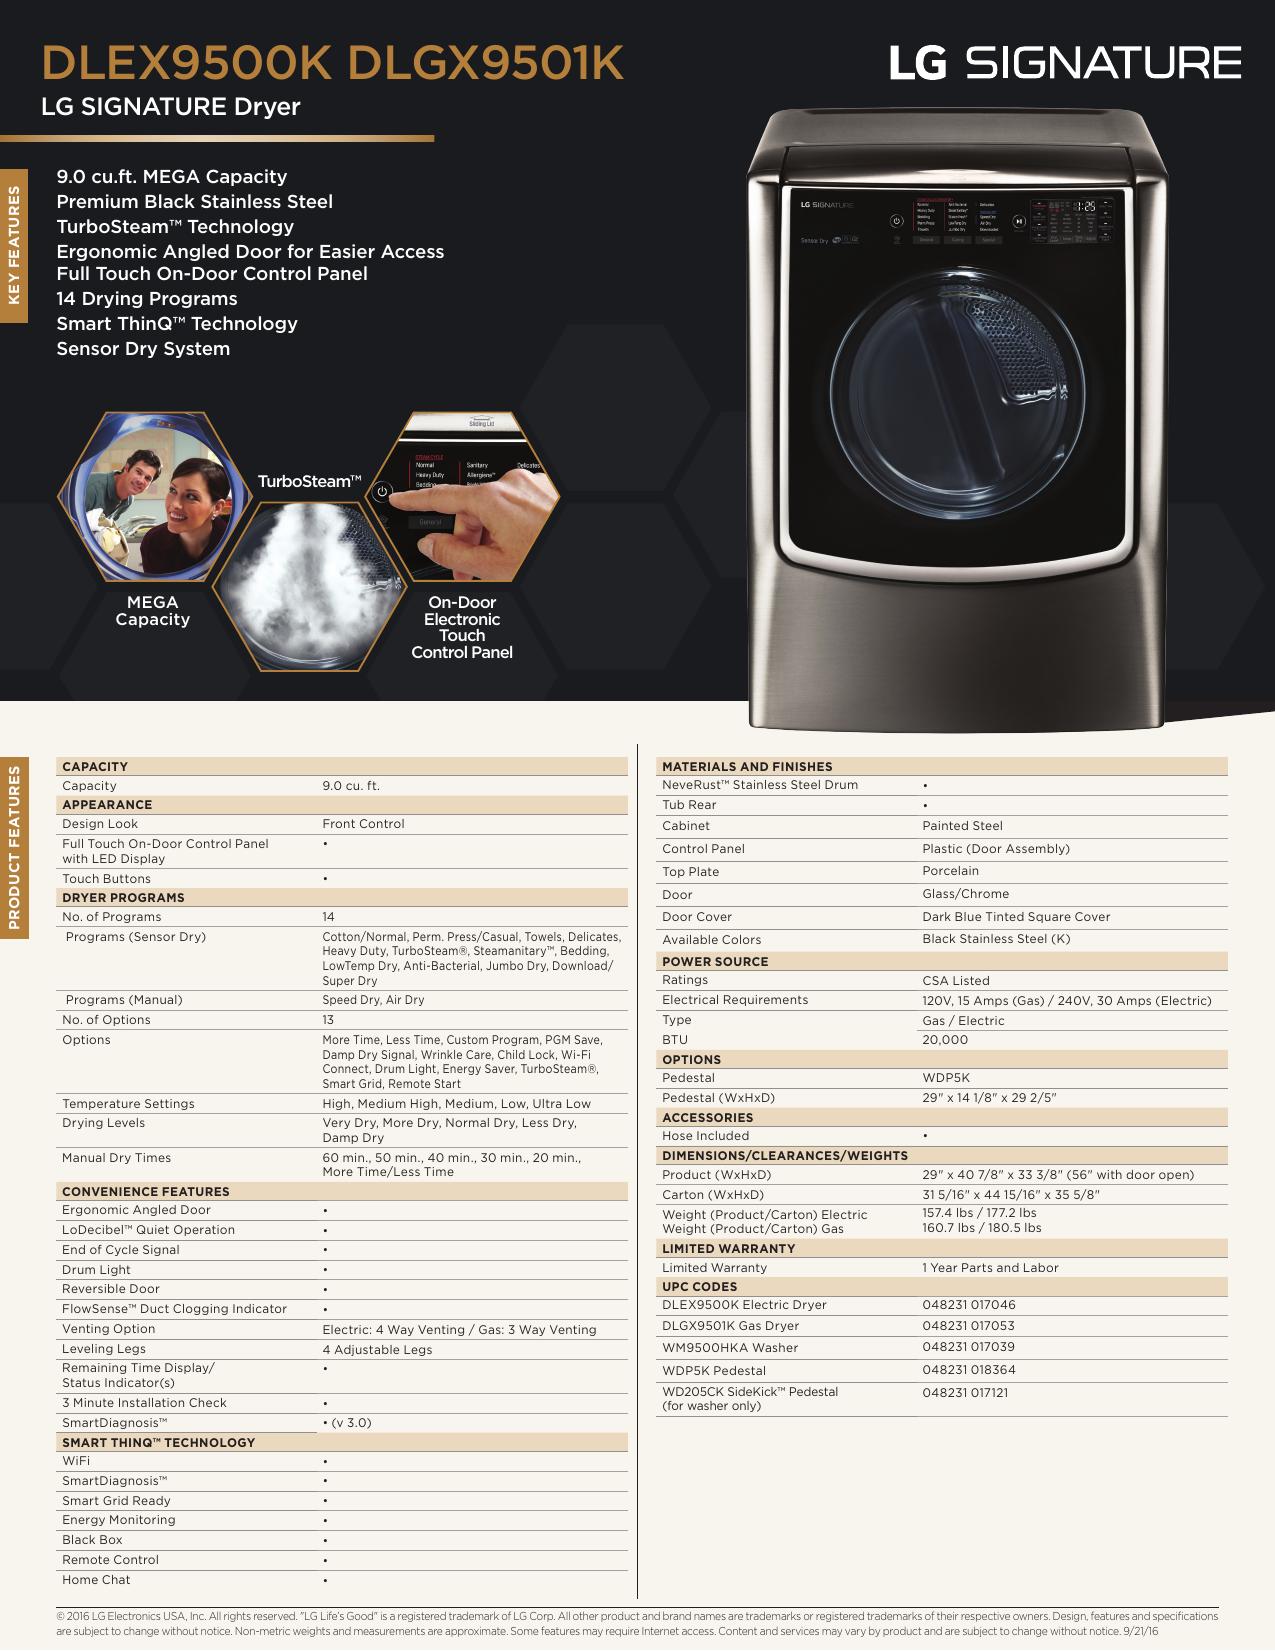 LG Signature DLEX9500K DLEX9500 DLGX9501 Spec Sheet   manualzz com